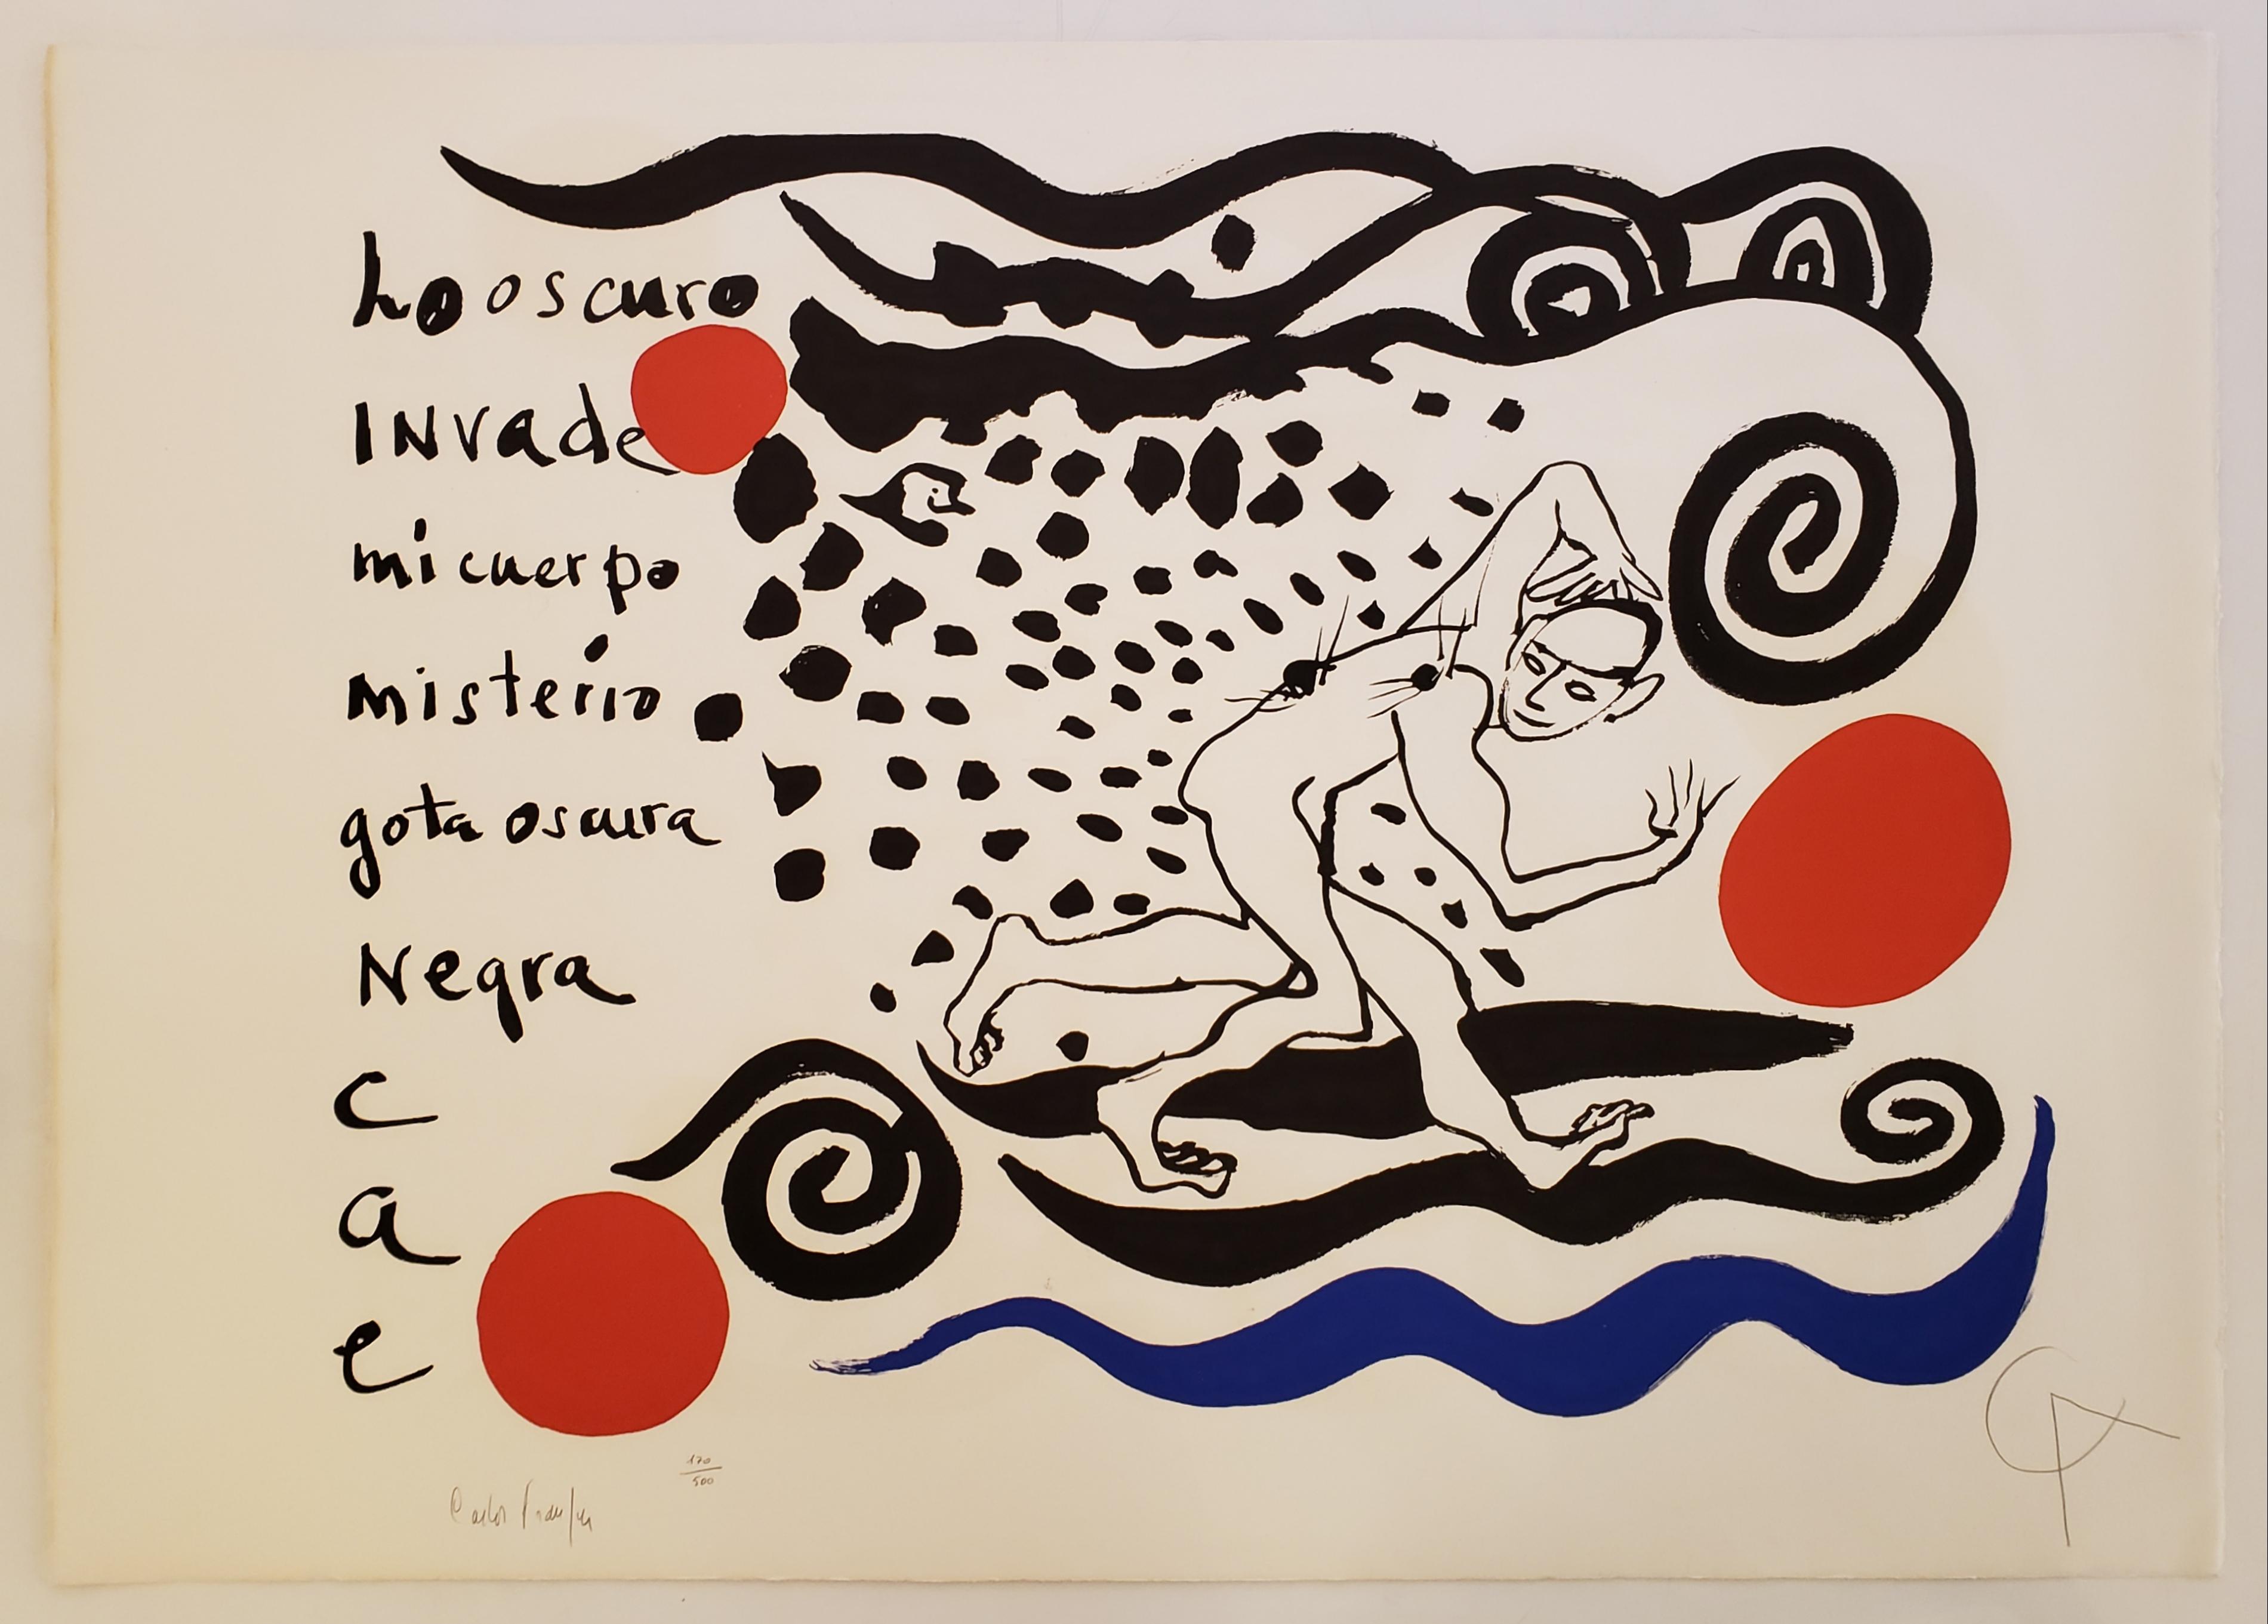 Alexander Calder - Abstract Grid